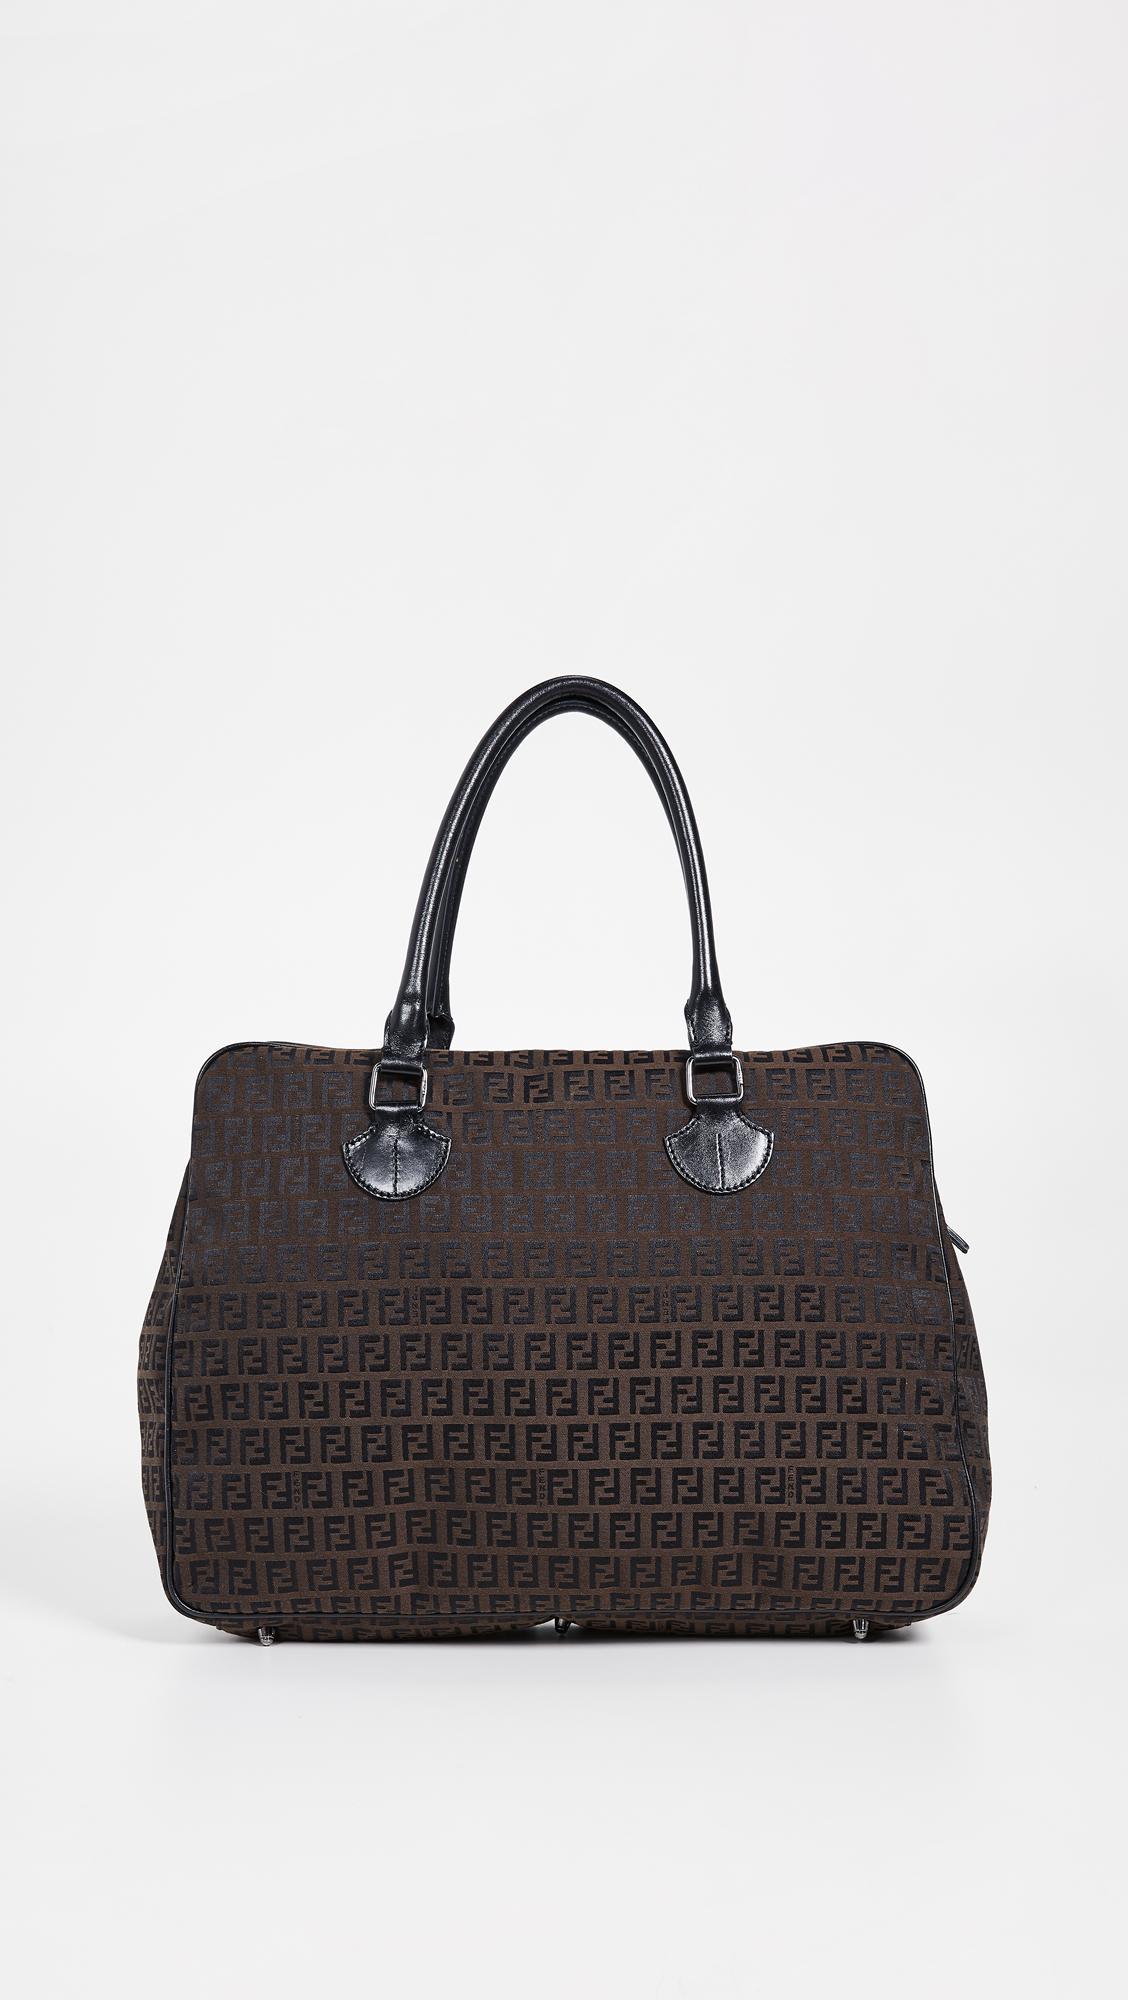 1cf330a13805 Lyst - What Goes Around Comes Around Fendi Zucchino Tote Bag in Black